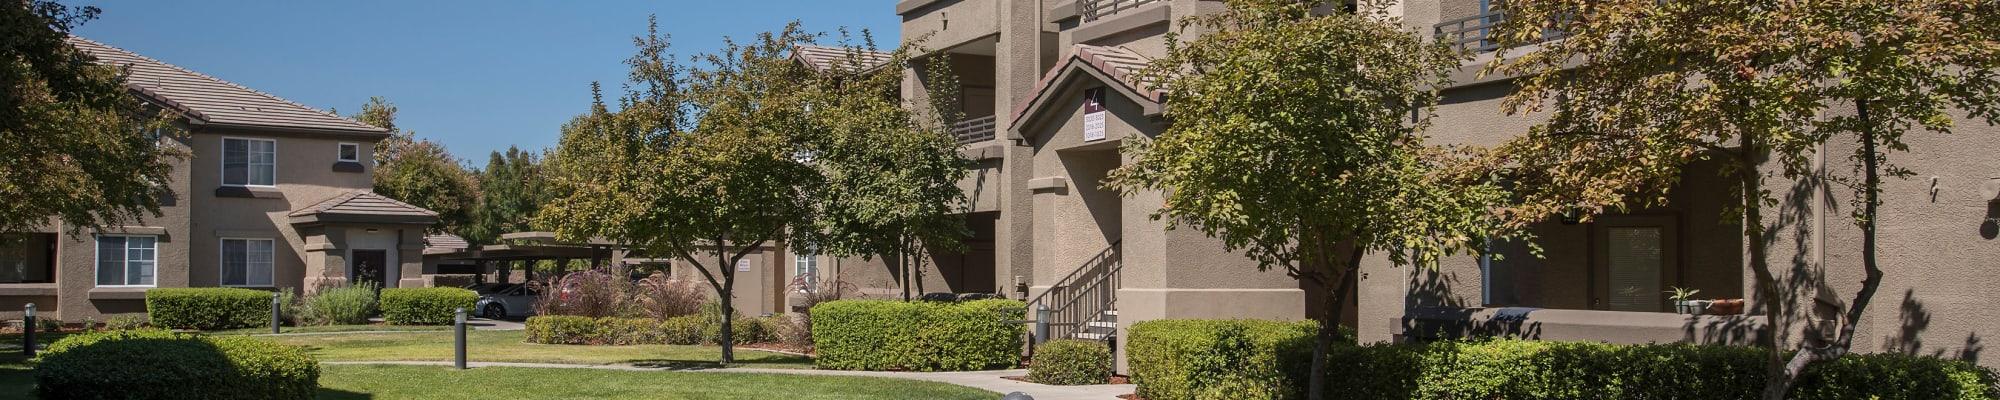 Photo gallery at The Artisan Apartment Homes in Sacramento, California